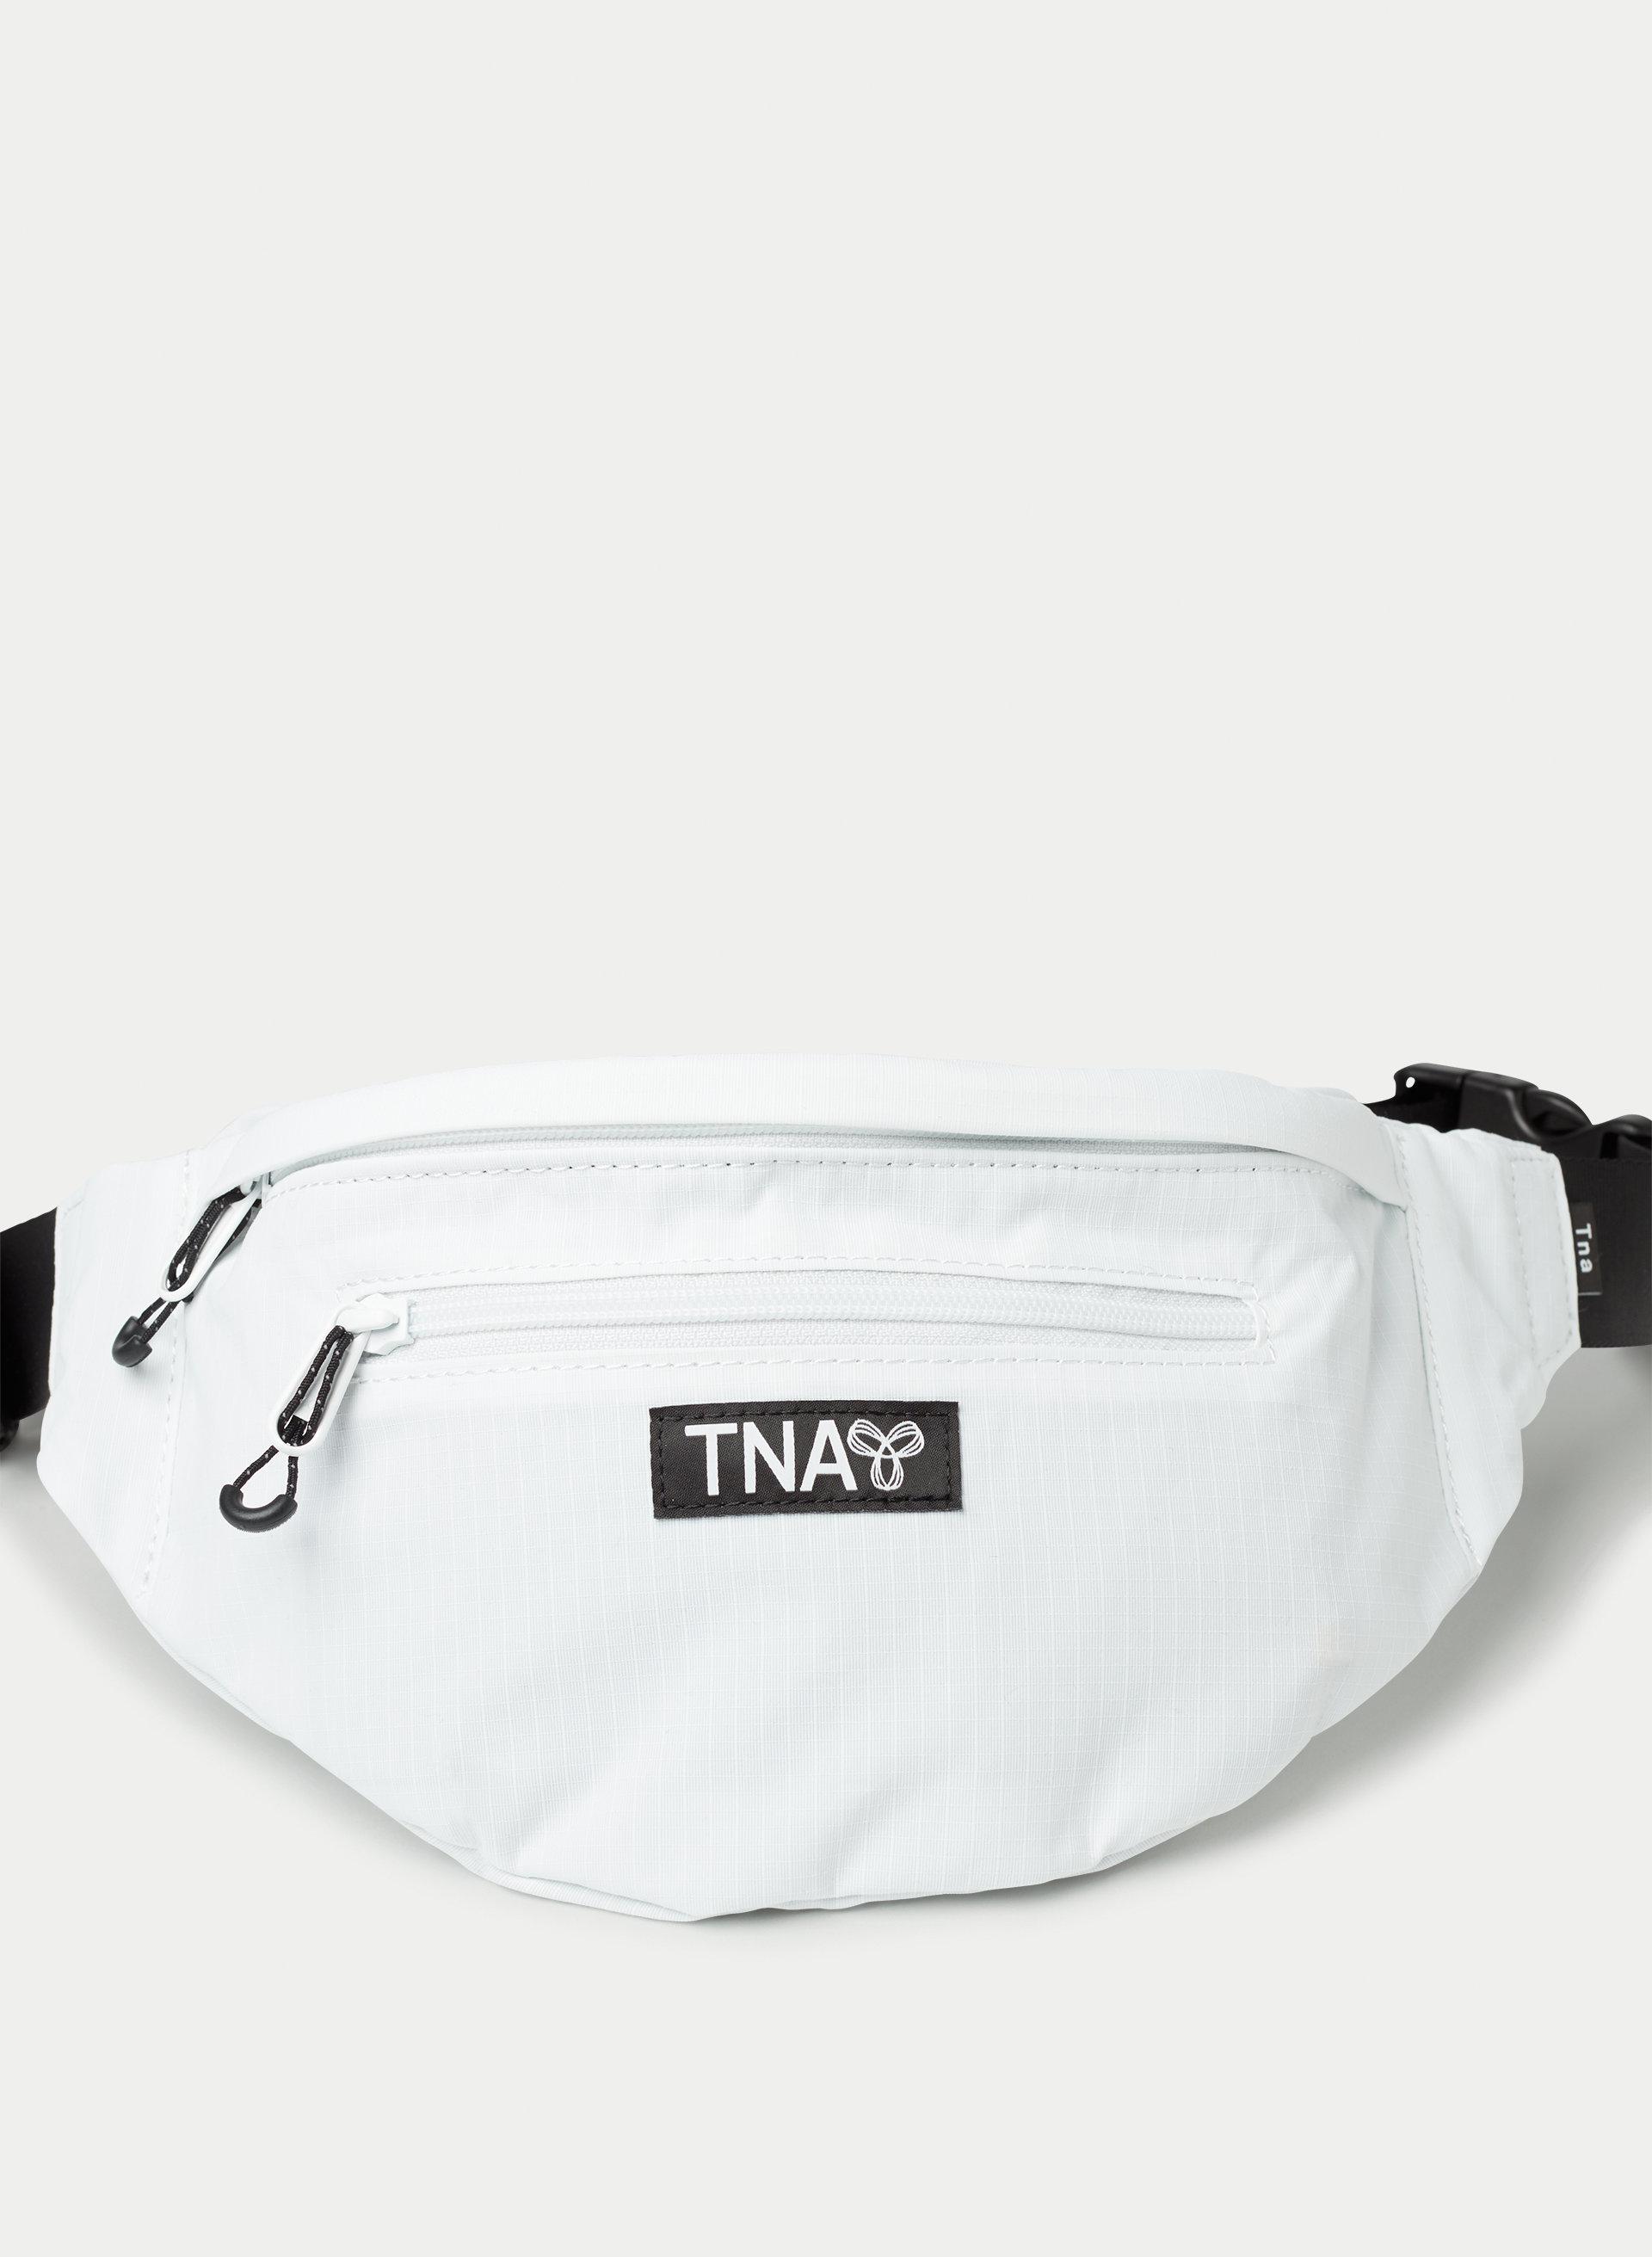 896c33014cff ANNI WAIST PACK - Nylon crossbody bag